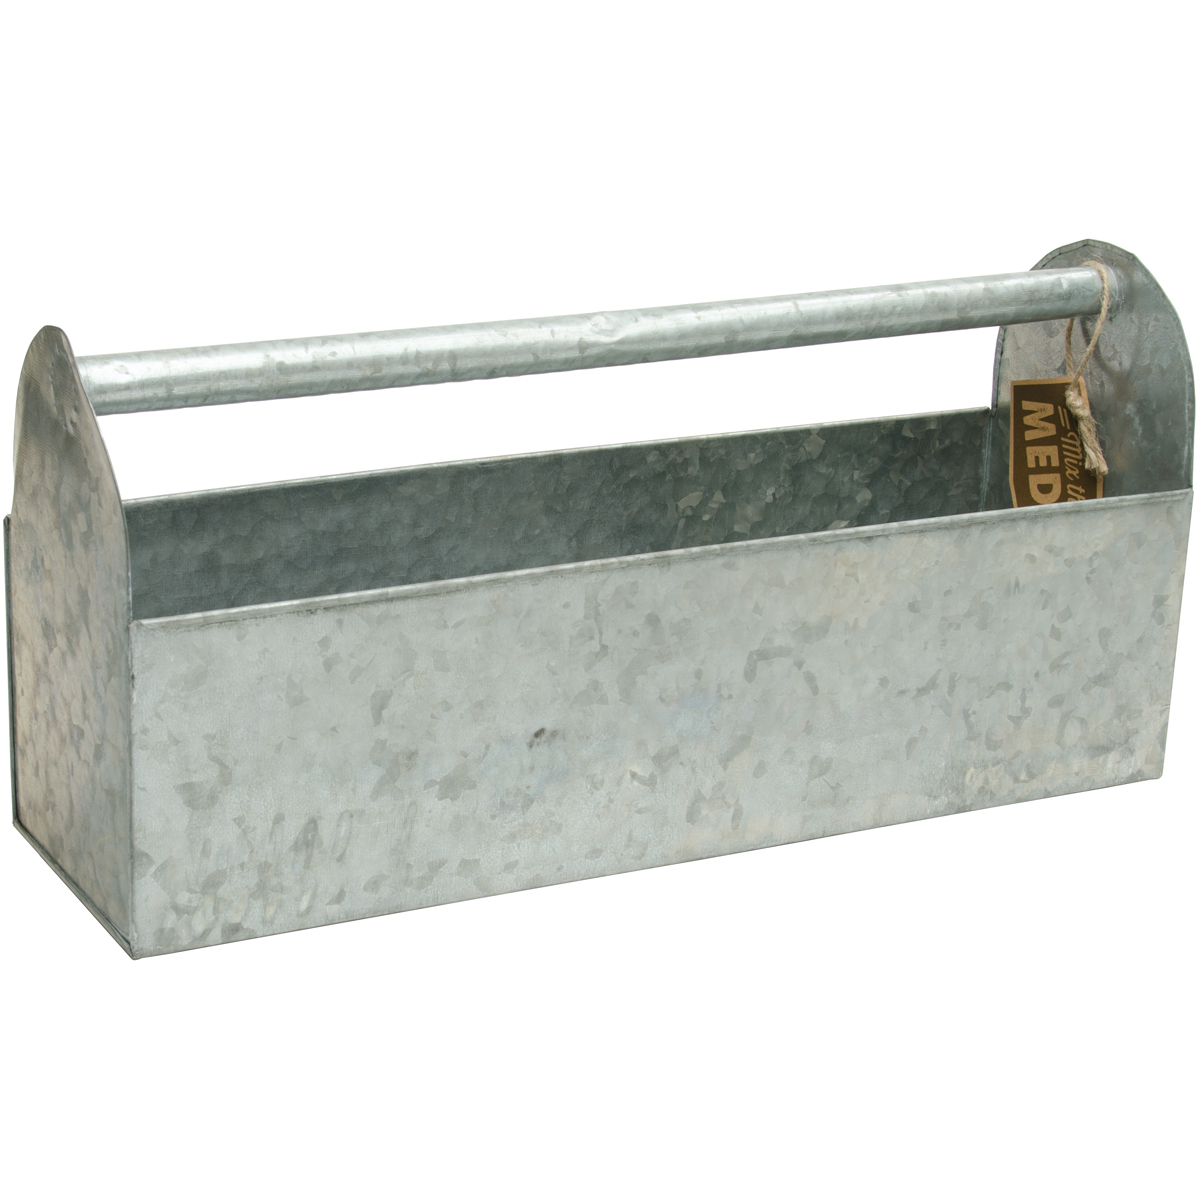 Galvanized Tool Box Large